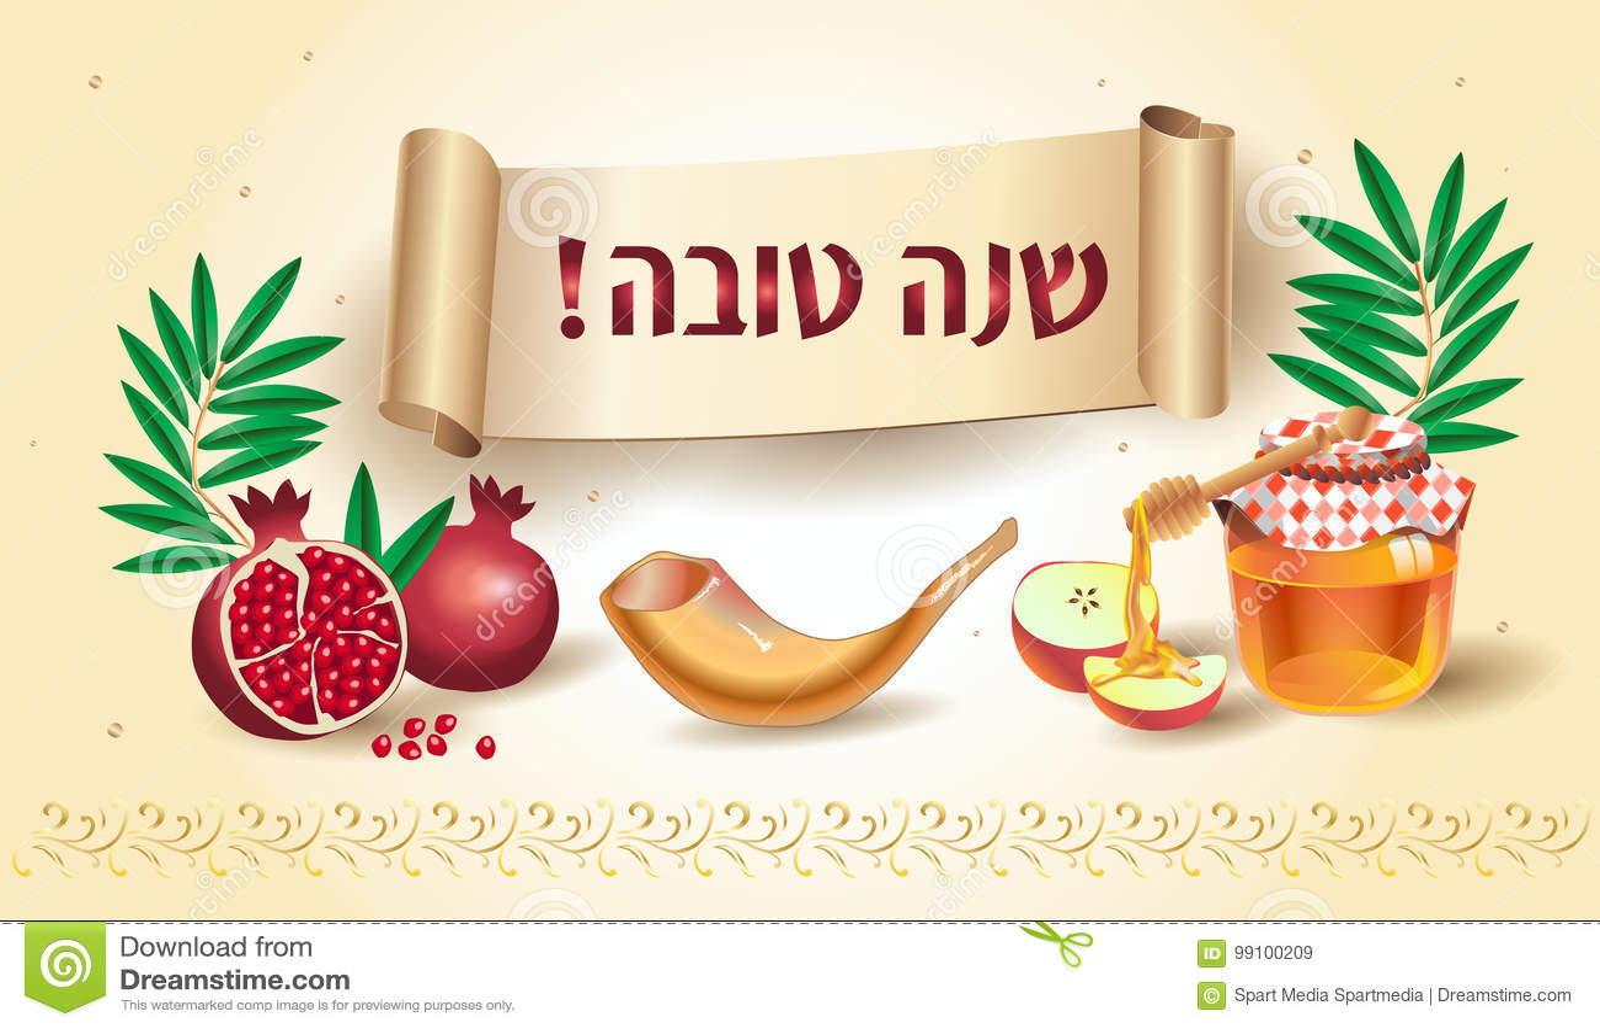 Rosh Hashanah Card Stock Vector Illustration Of Floral 99100209